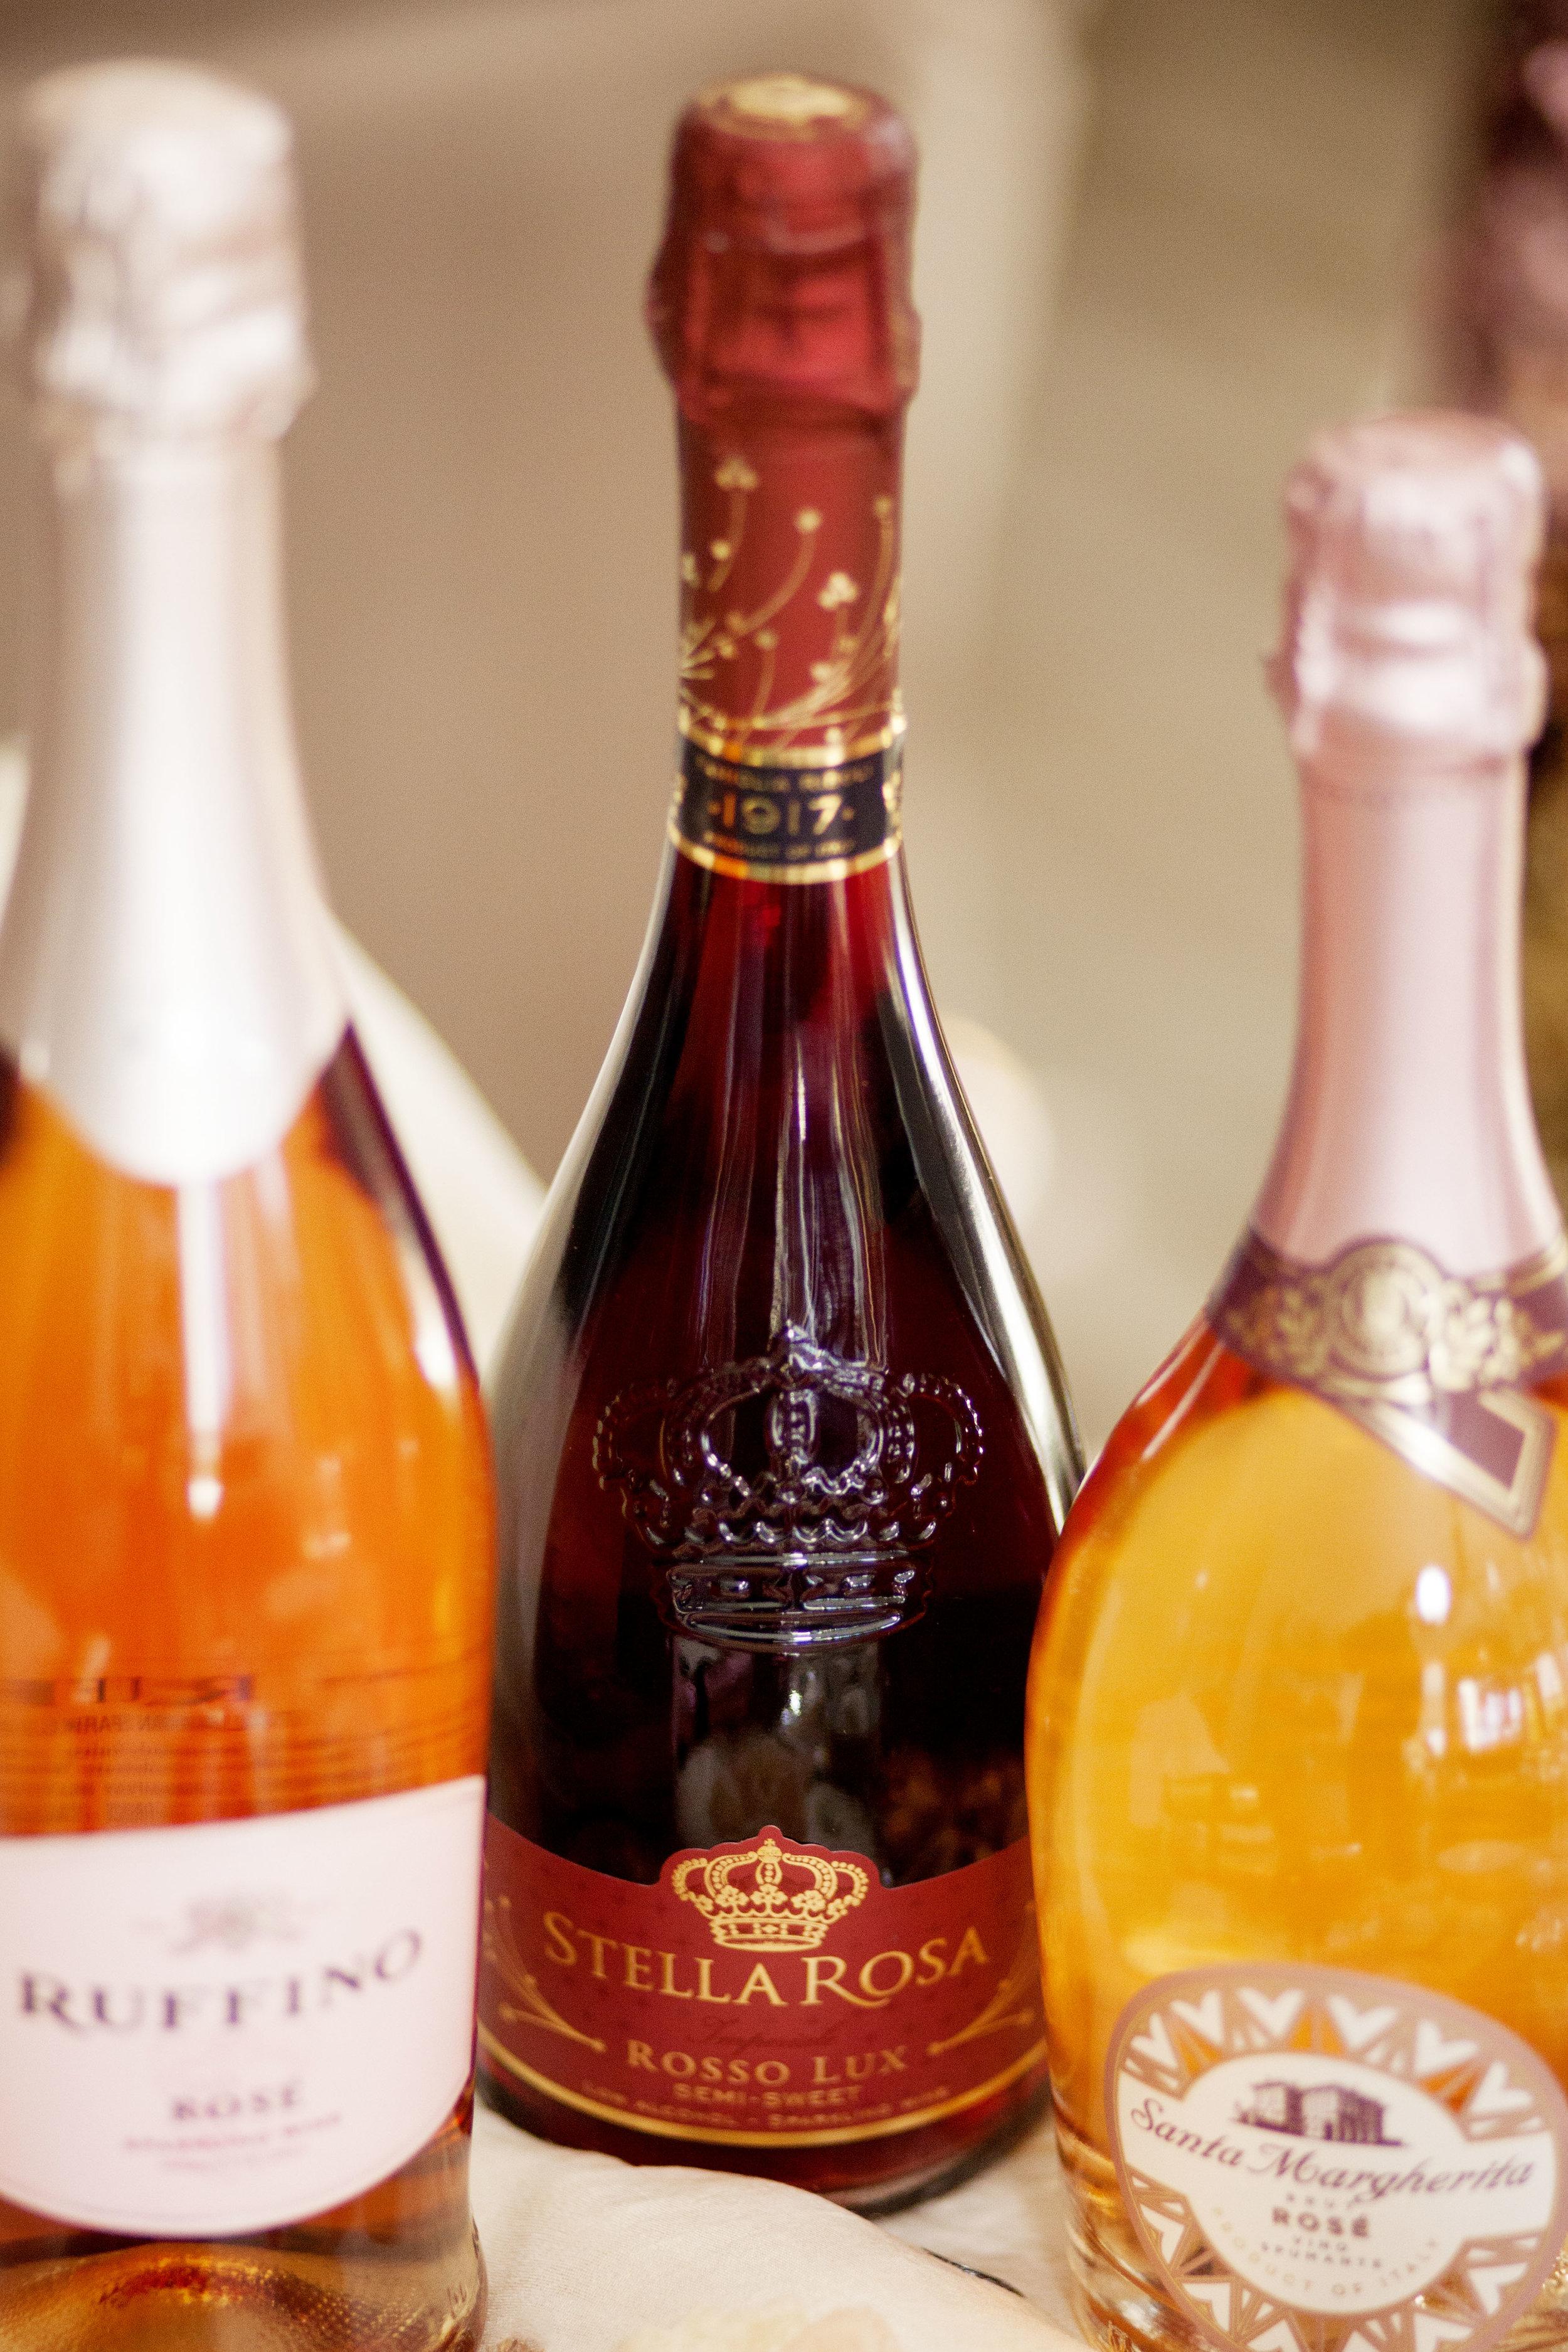 Stella Rosa Imperiale Rosso Lux - The Gilded Bellini